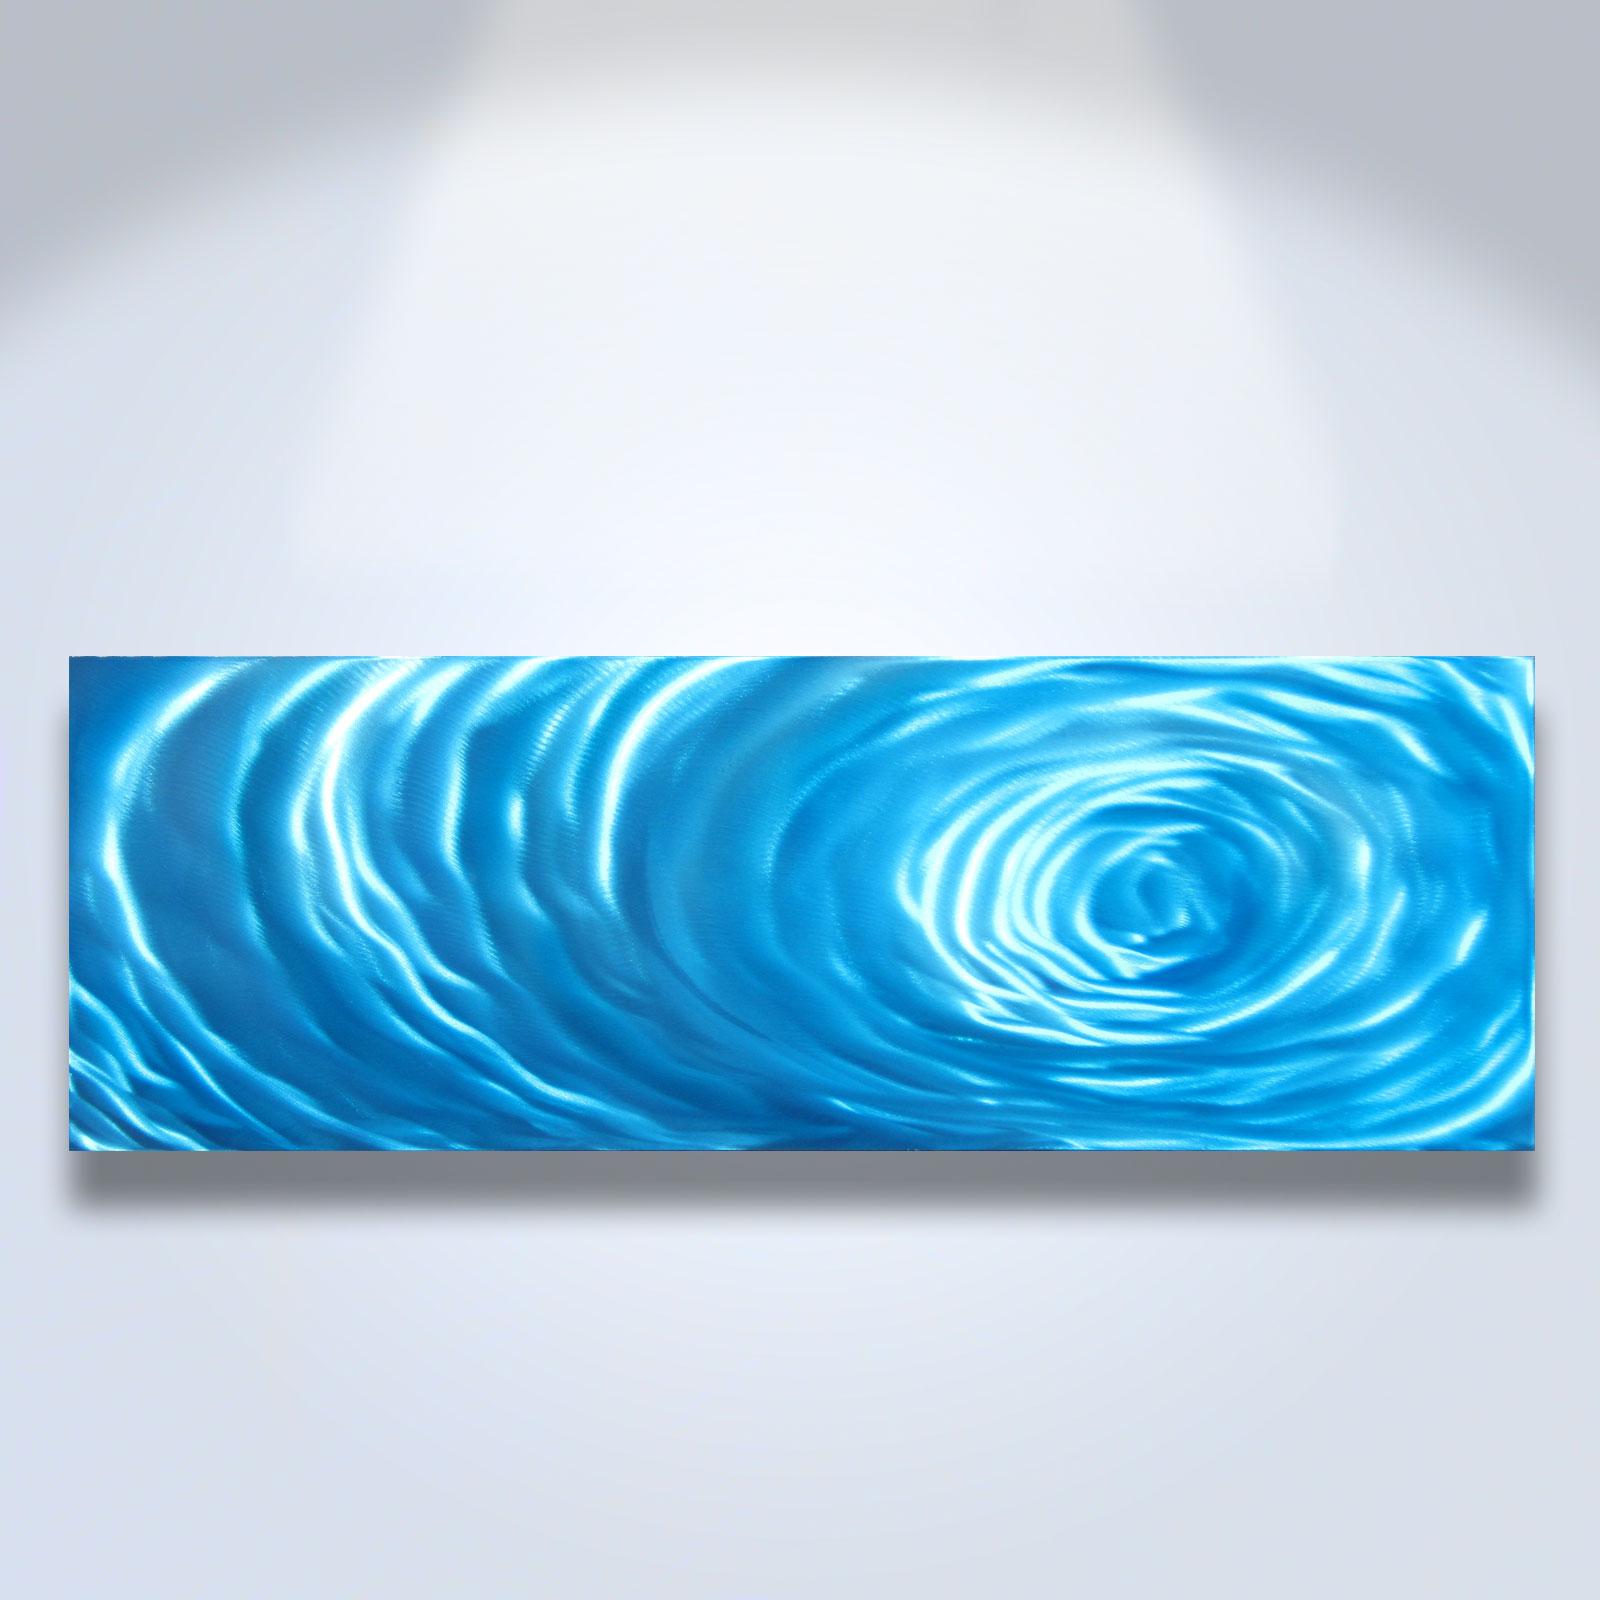 Small Blue Ripple - Metal Wall Art Abstract Sculpture Painting Modern Decor - Thumbnail 1 ...  sc 1 st  Inspiring Art Gallery & Small Blue Ripple - Metal Wall Art Abstract Sculpture Painting ...